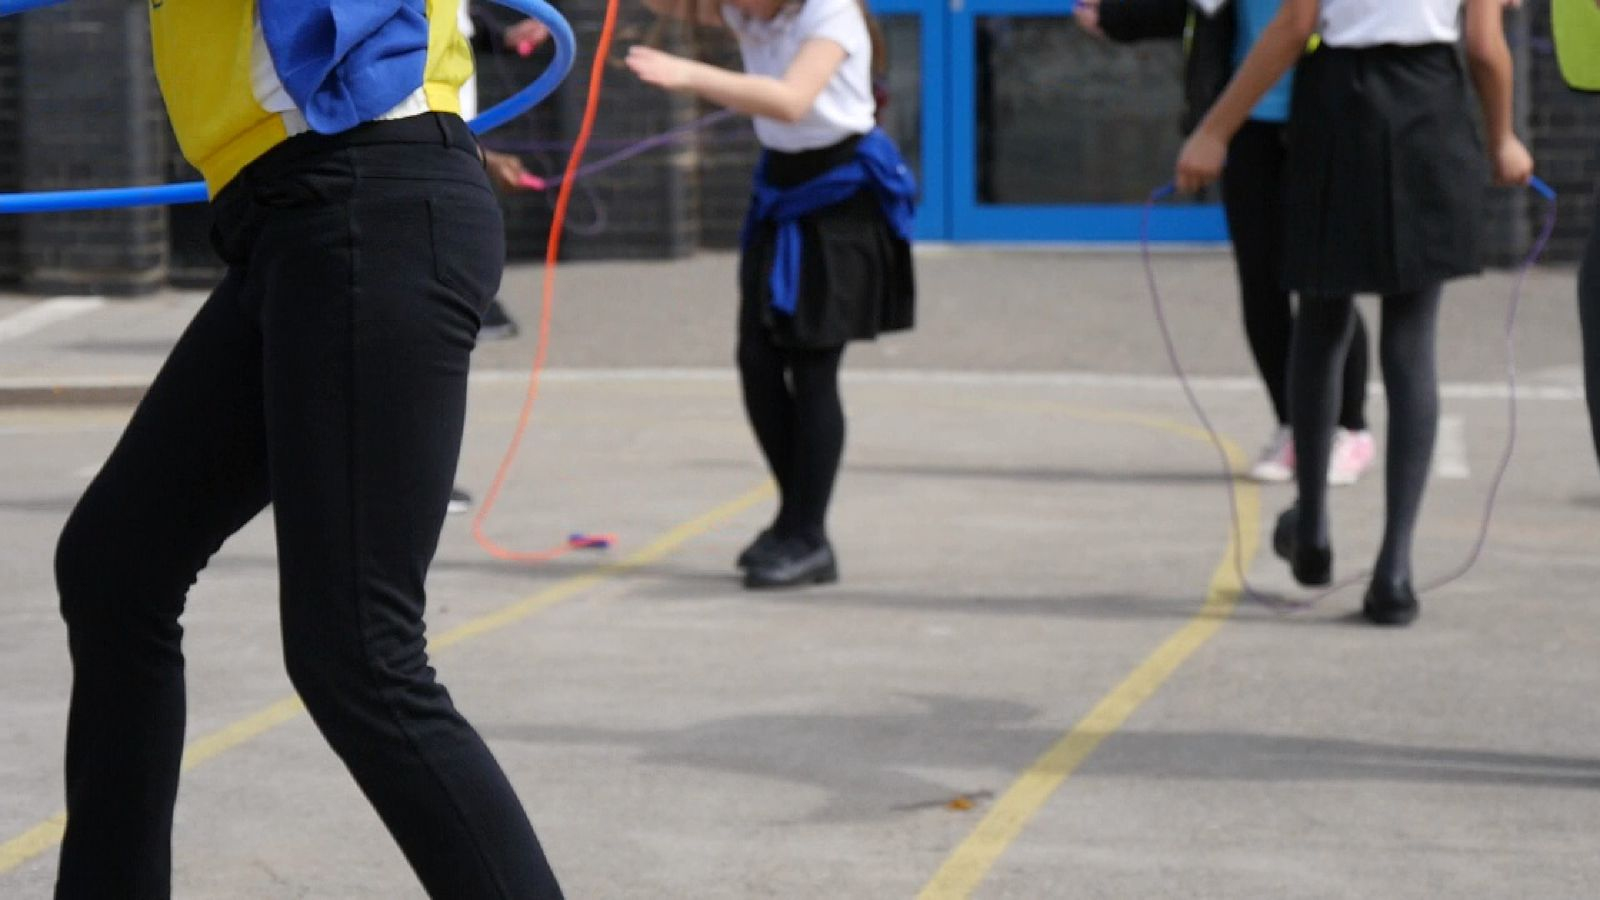 Anon school children playing in playground.